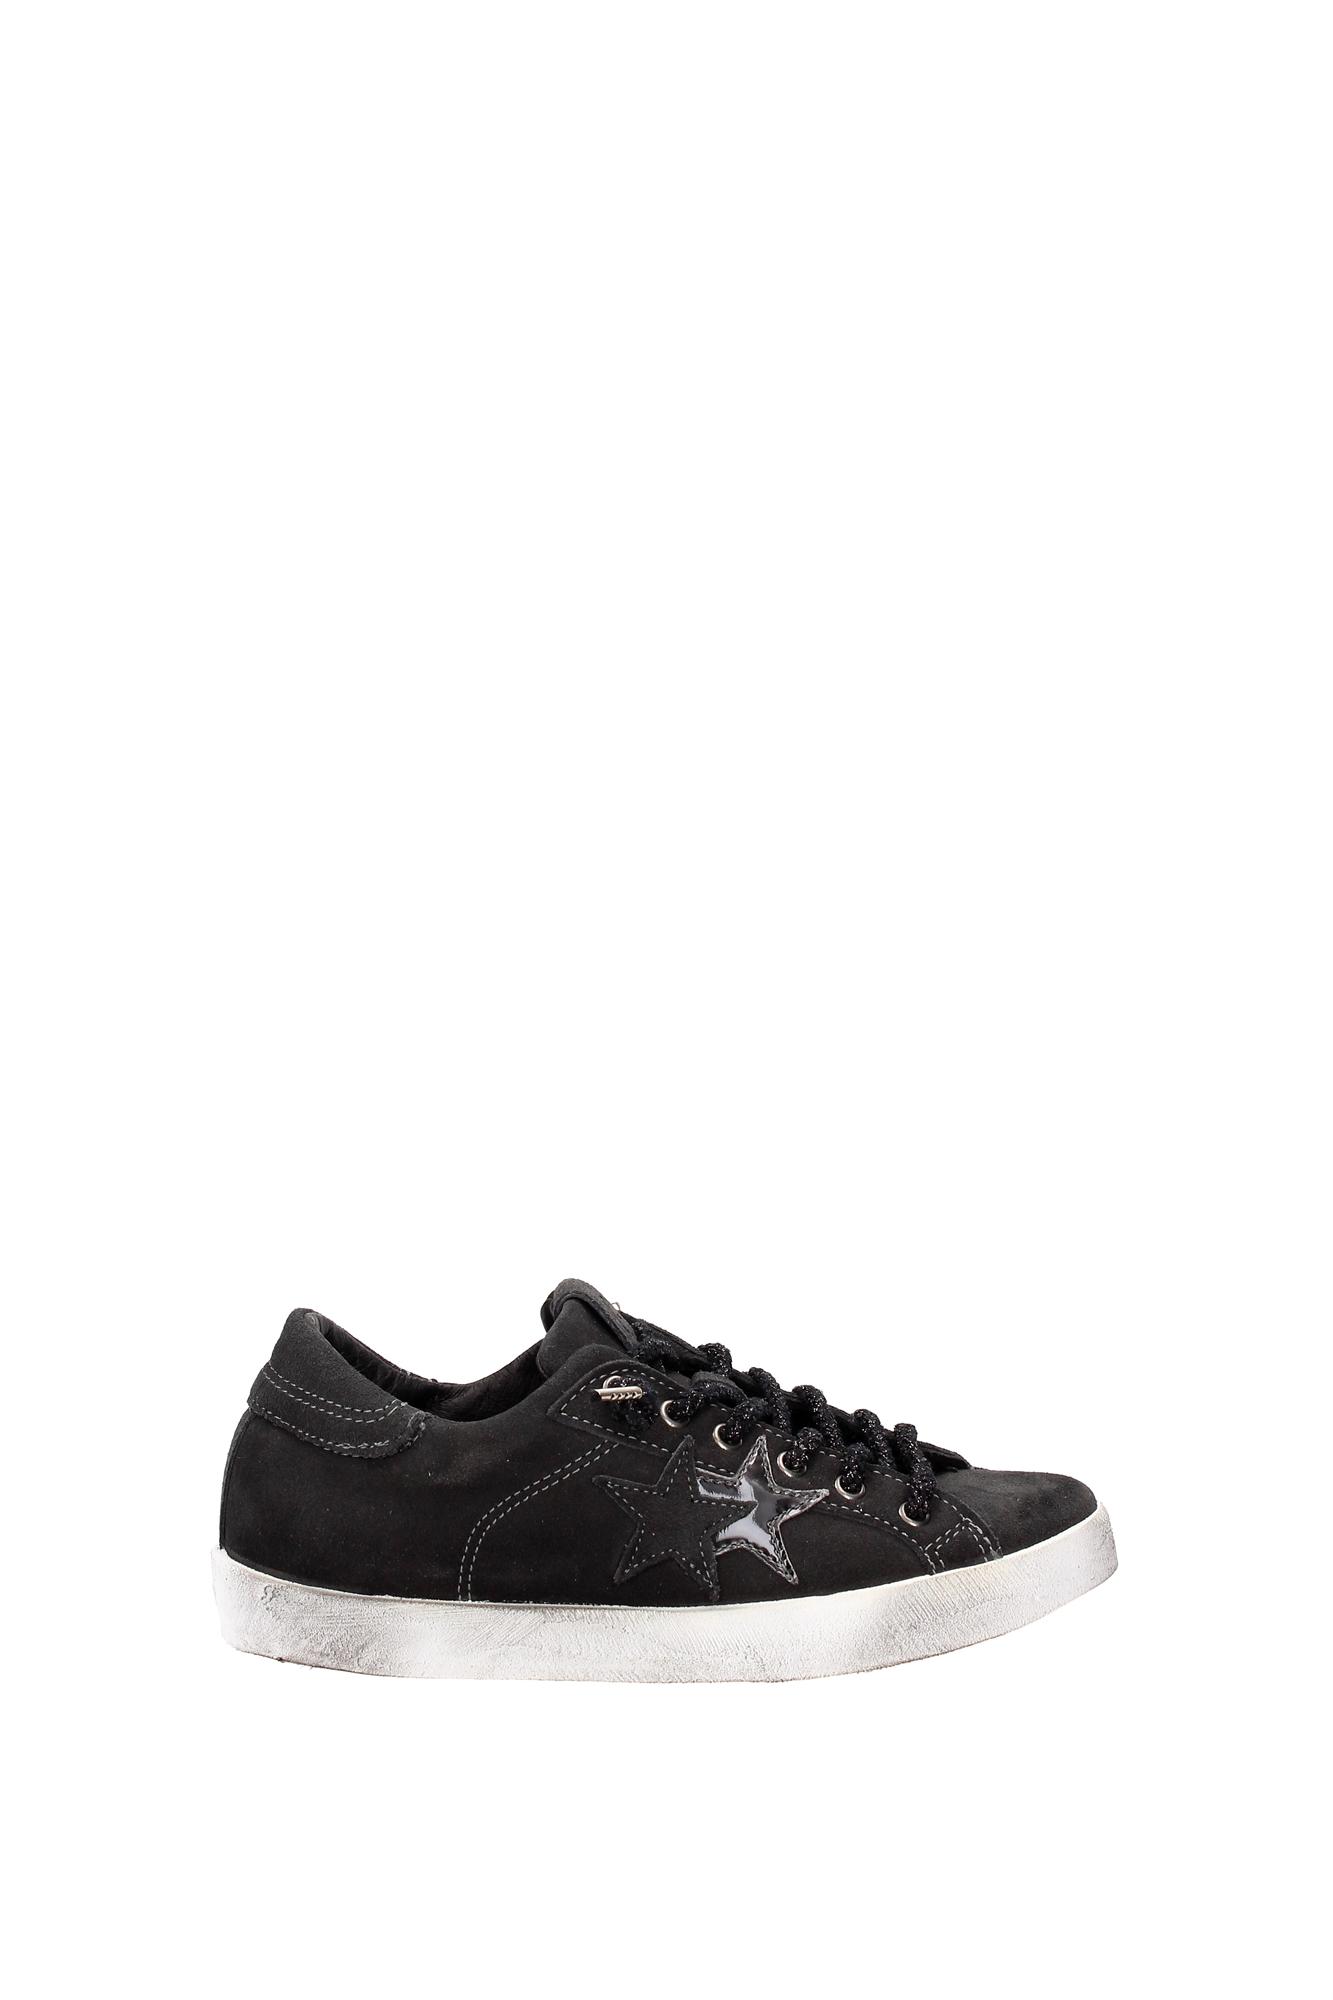 Sneakers 2star Damenschuhe Damenschuhe 2star - Camoscio (2S885ANTRACITE) 3832c0